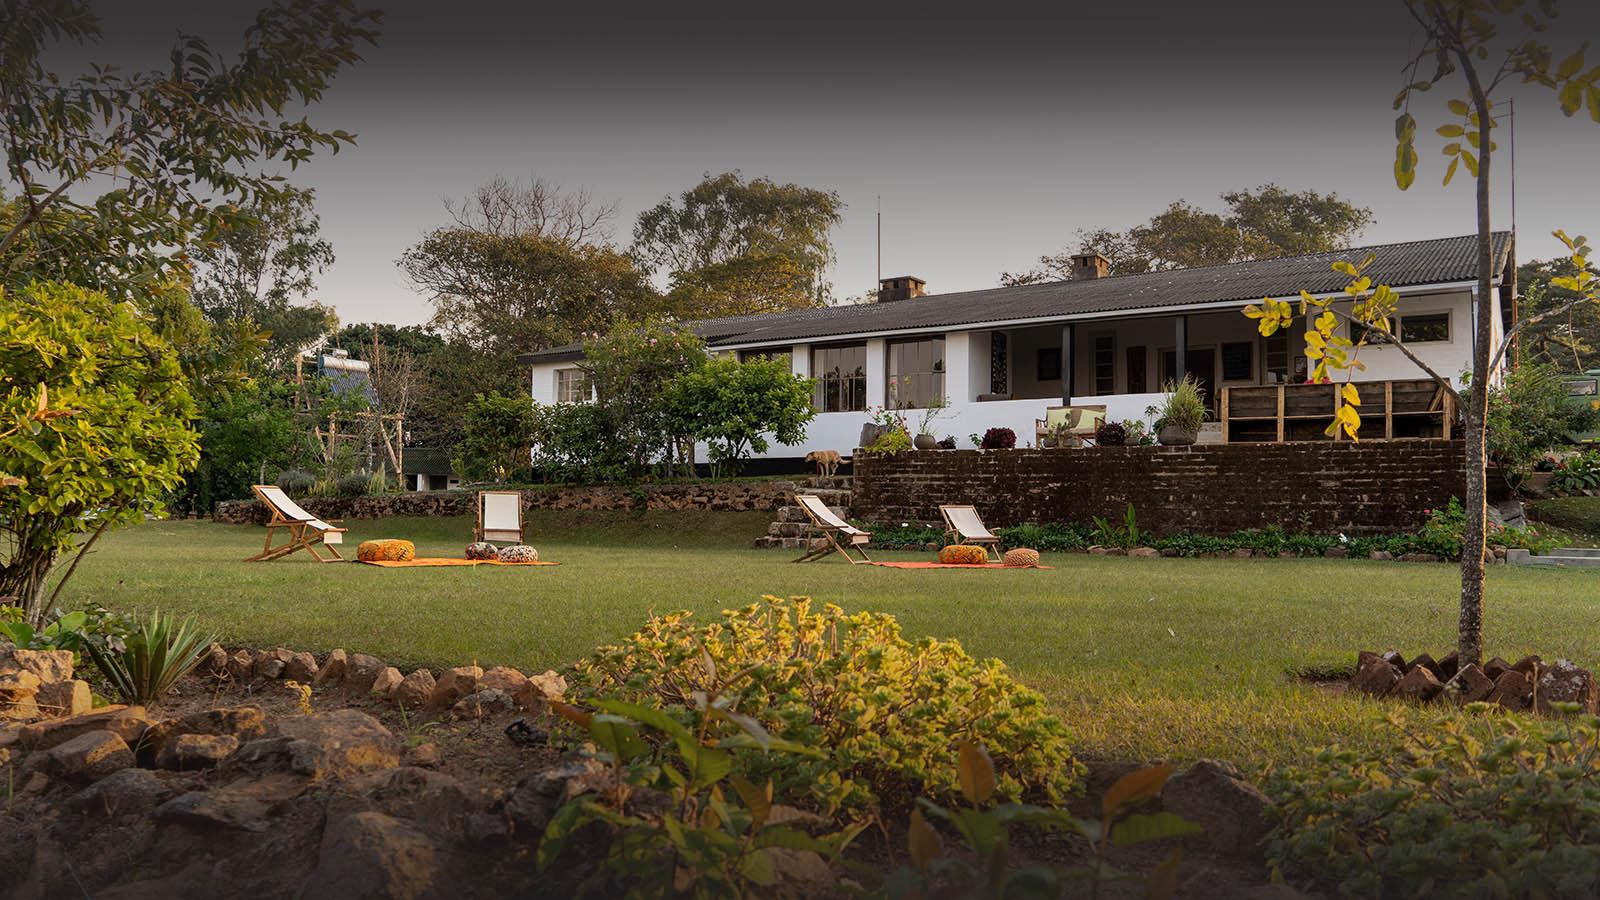 ntchisi forest lodge malawi-lodges-malawian-style-lilongwe-beautiful-scenery-eco-friendly-lodge-front-view